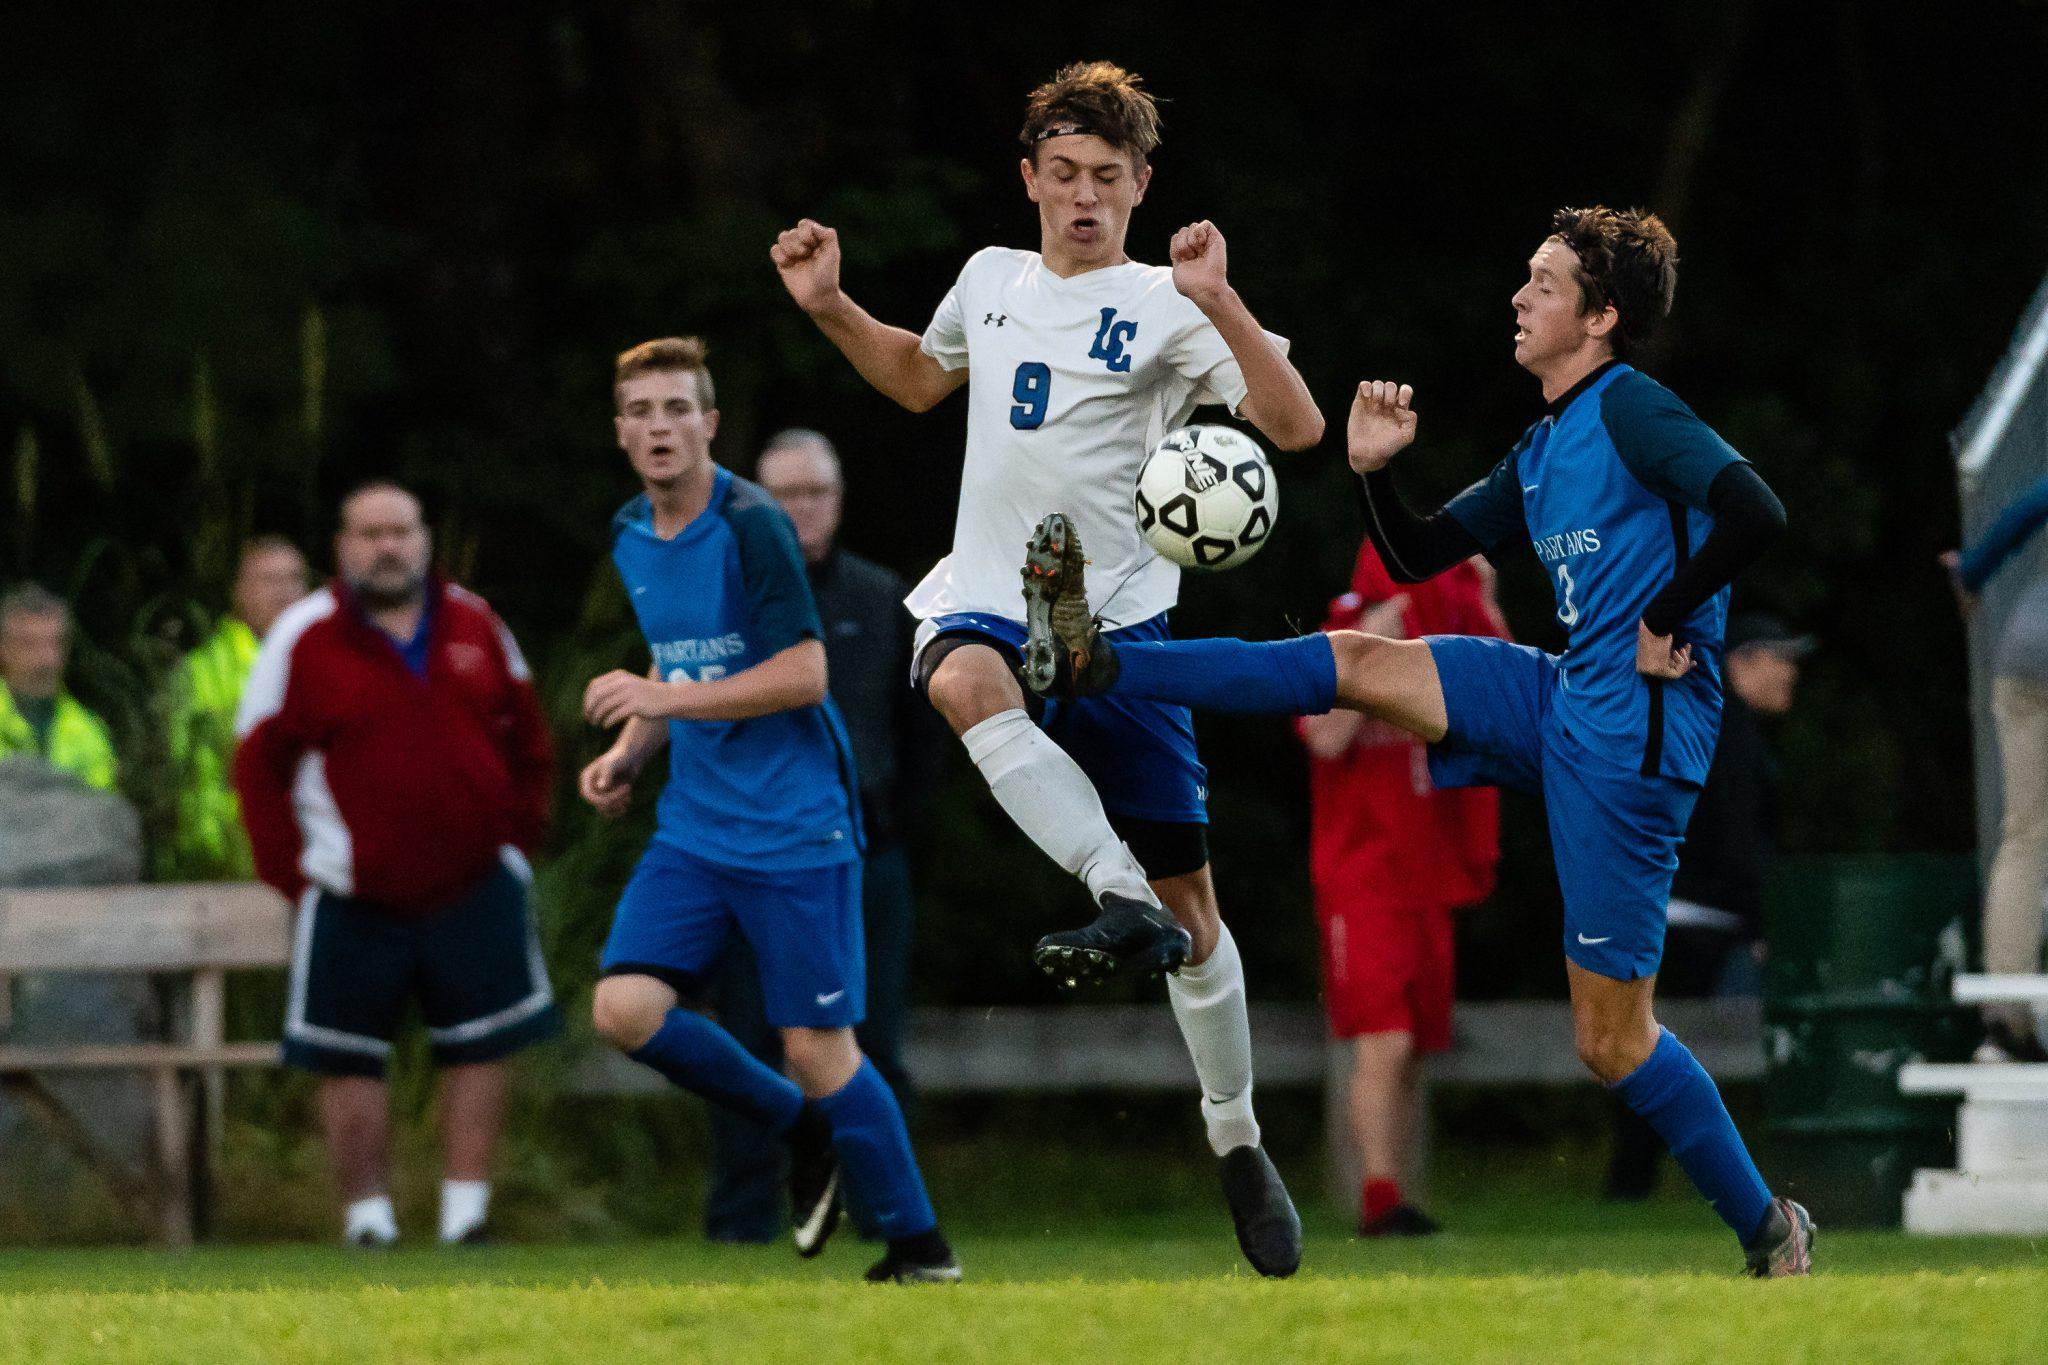 Boys soccer Top 10: Mills, Litchfield, Watertown earn honor | The Zones